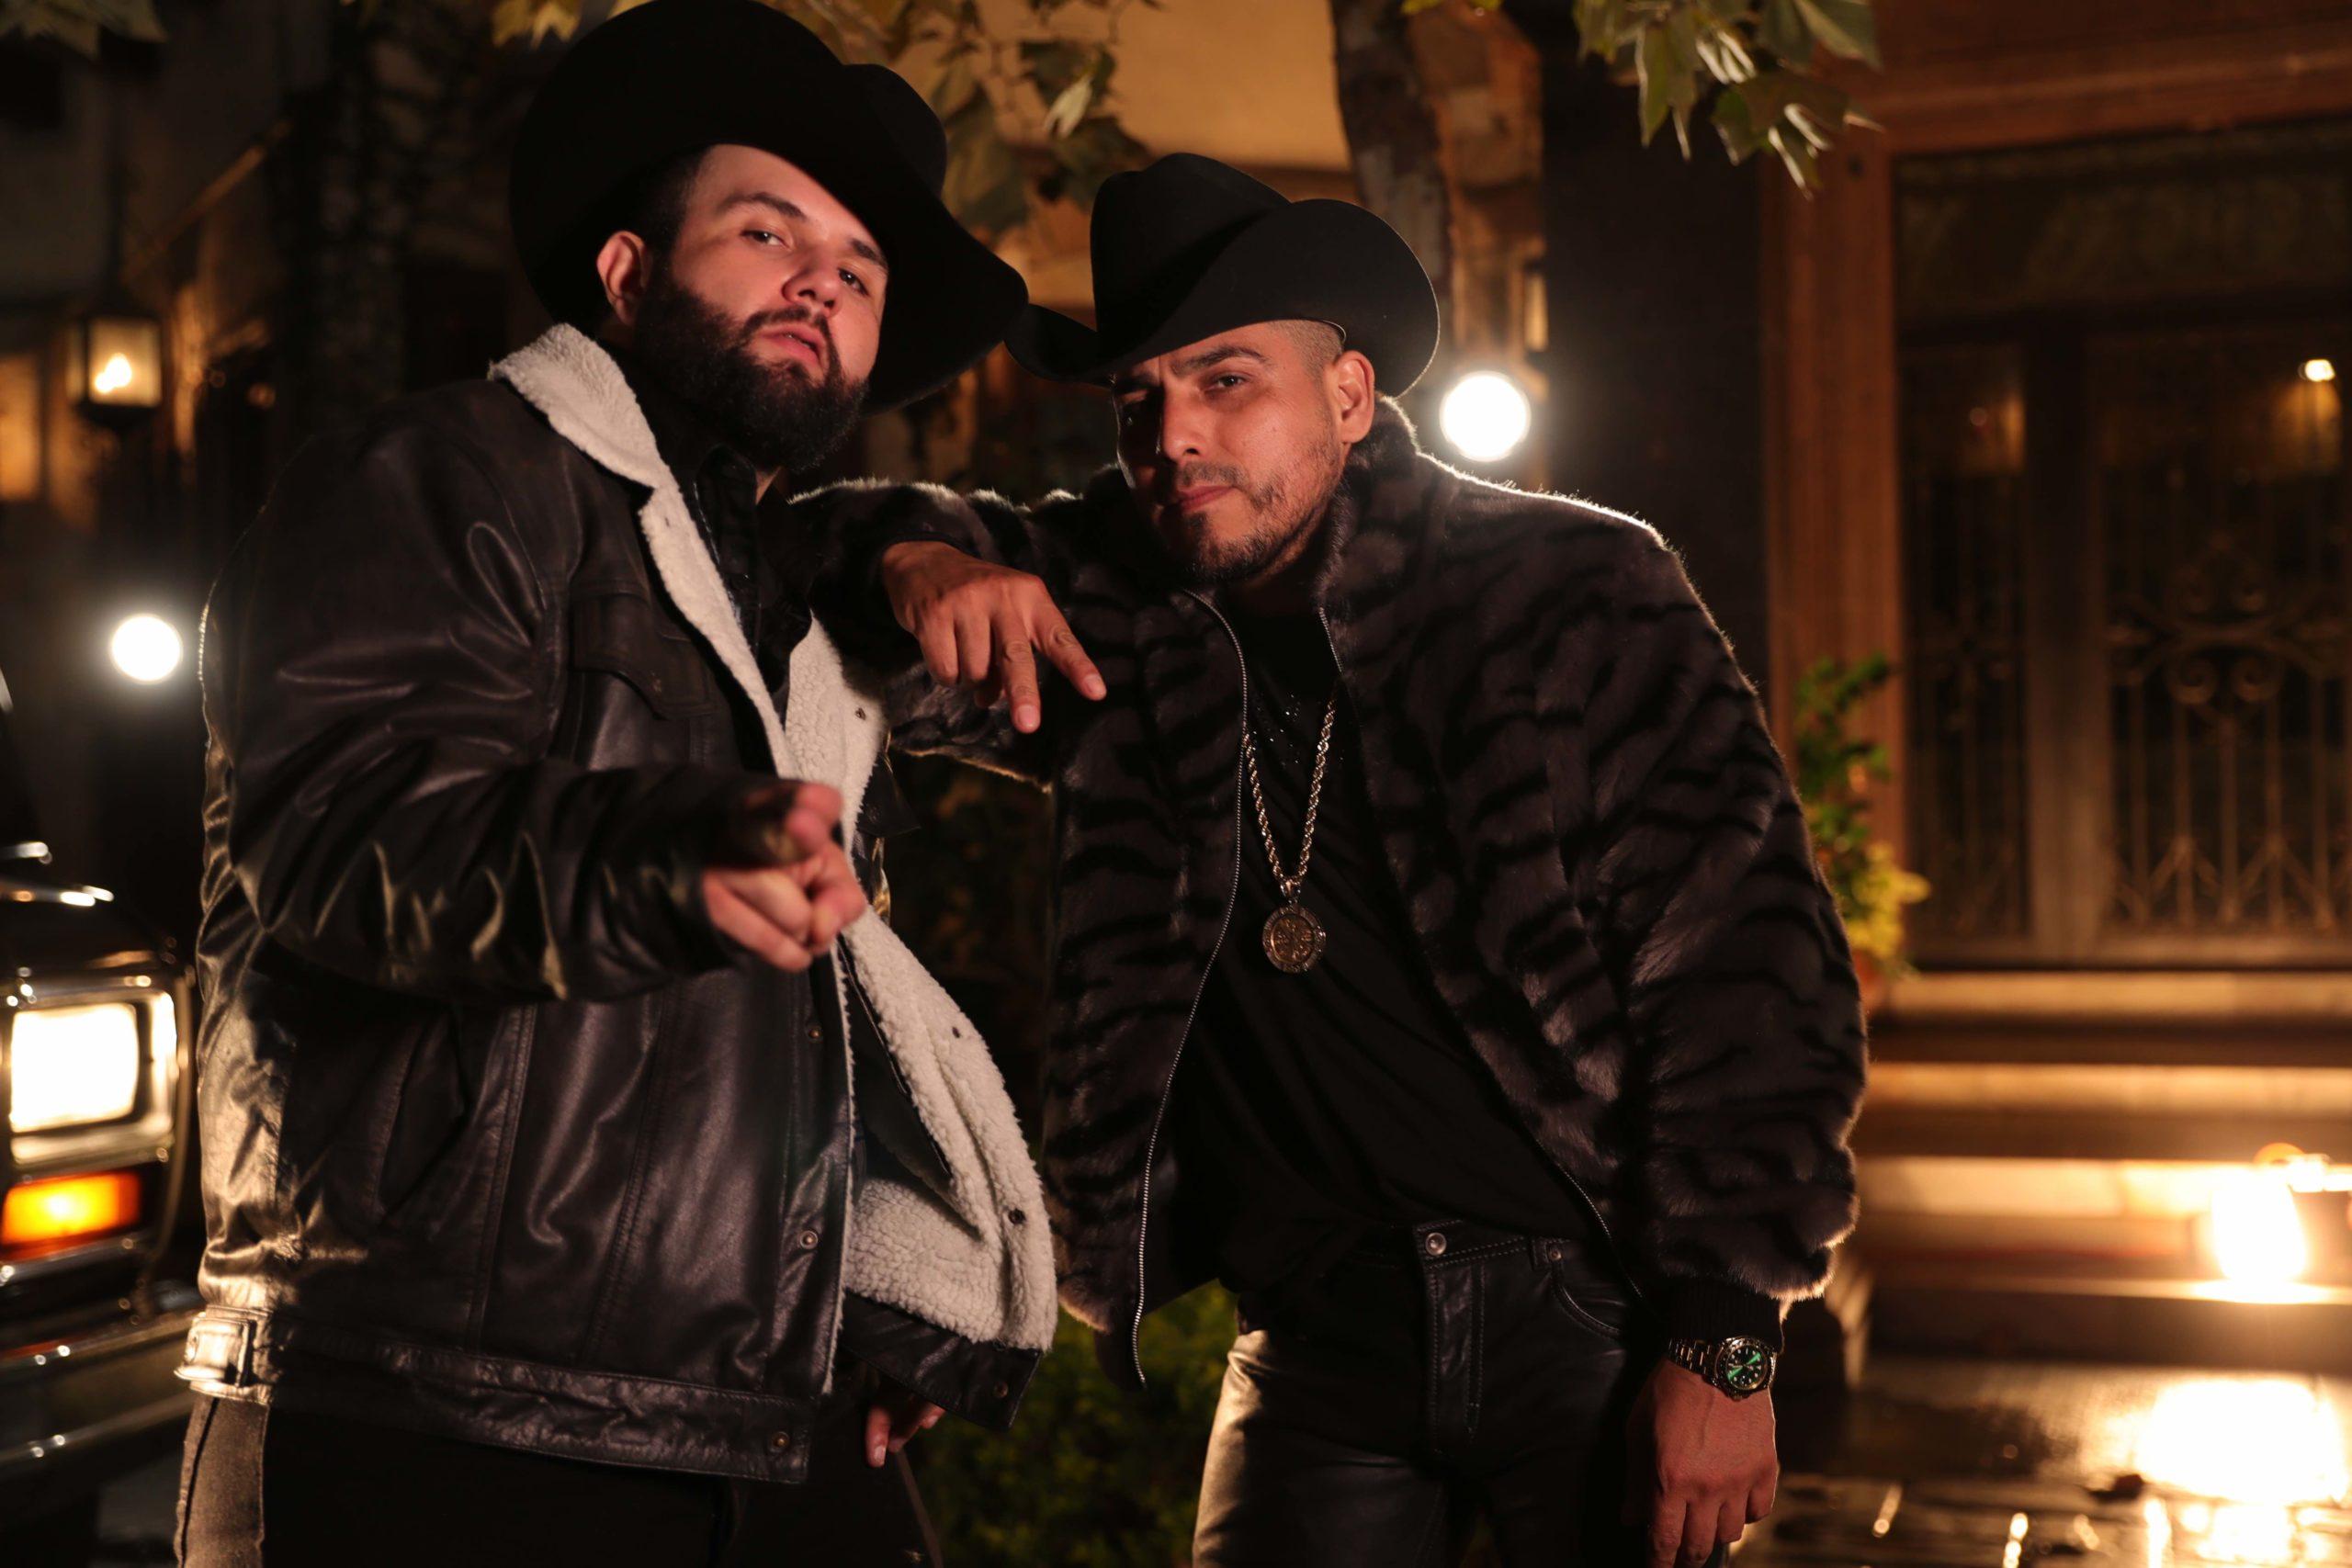 Espinoza Paz ft. Carin Leon - Como Duele Equivocarse (Video Oficial)